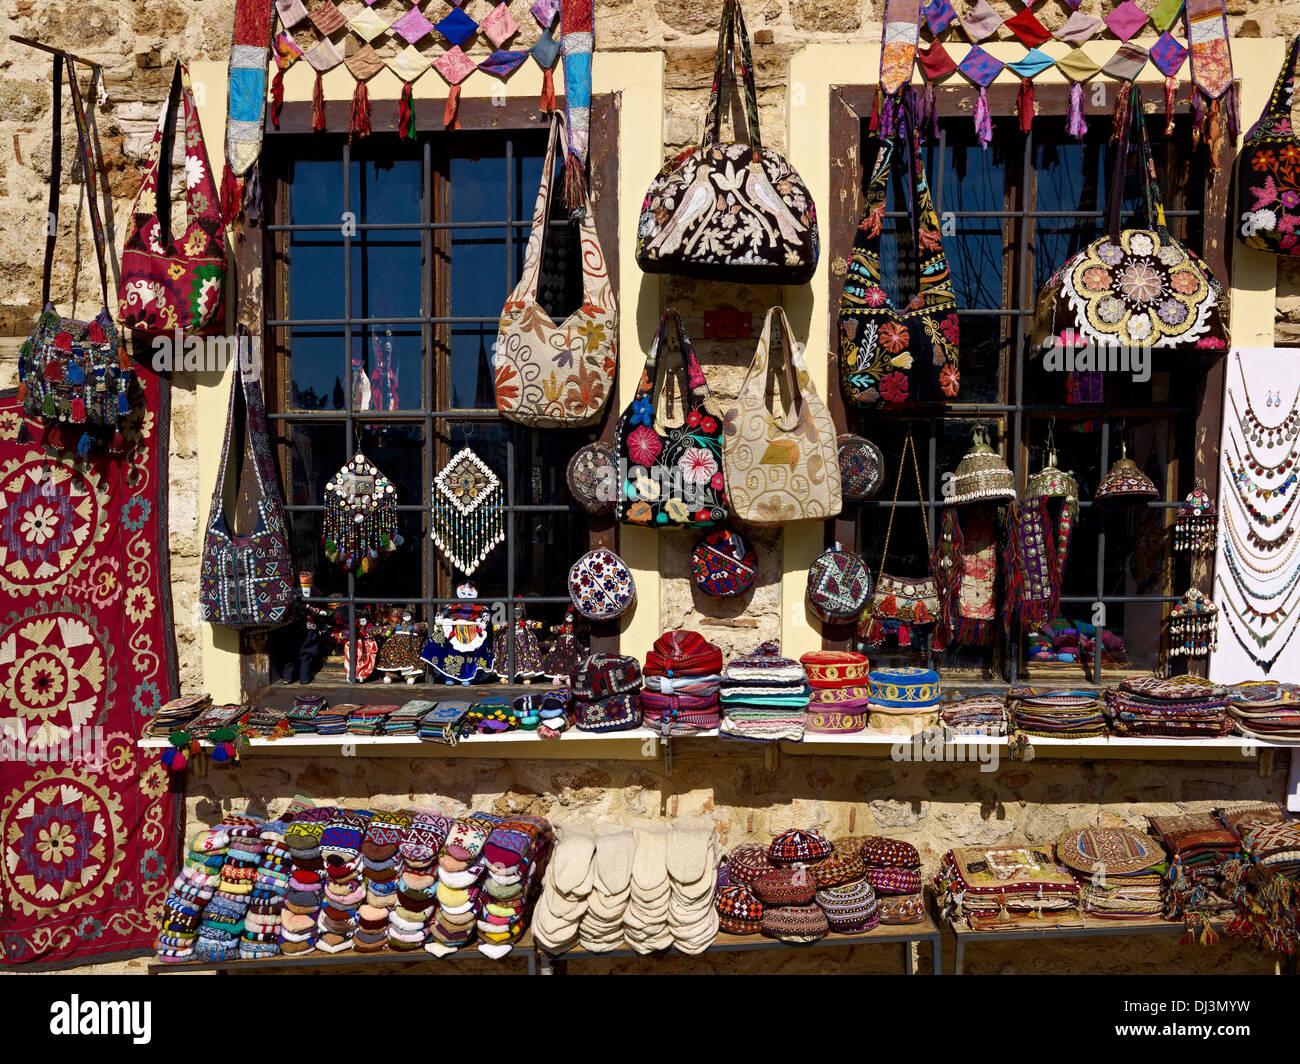 Shop with folk art, old town, Antalya, Turkey - Stock Image